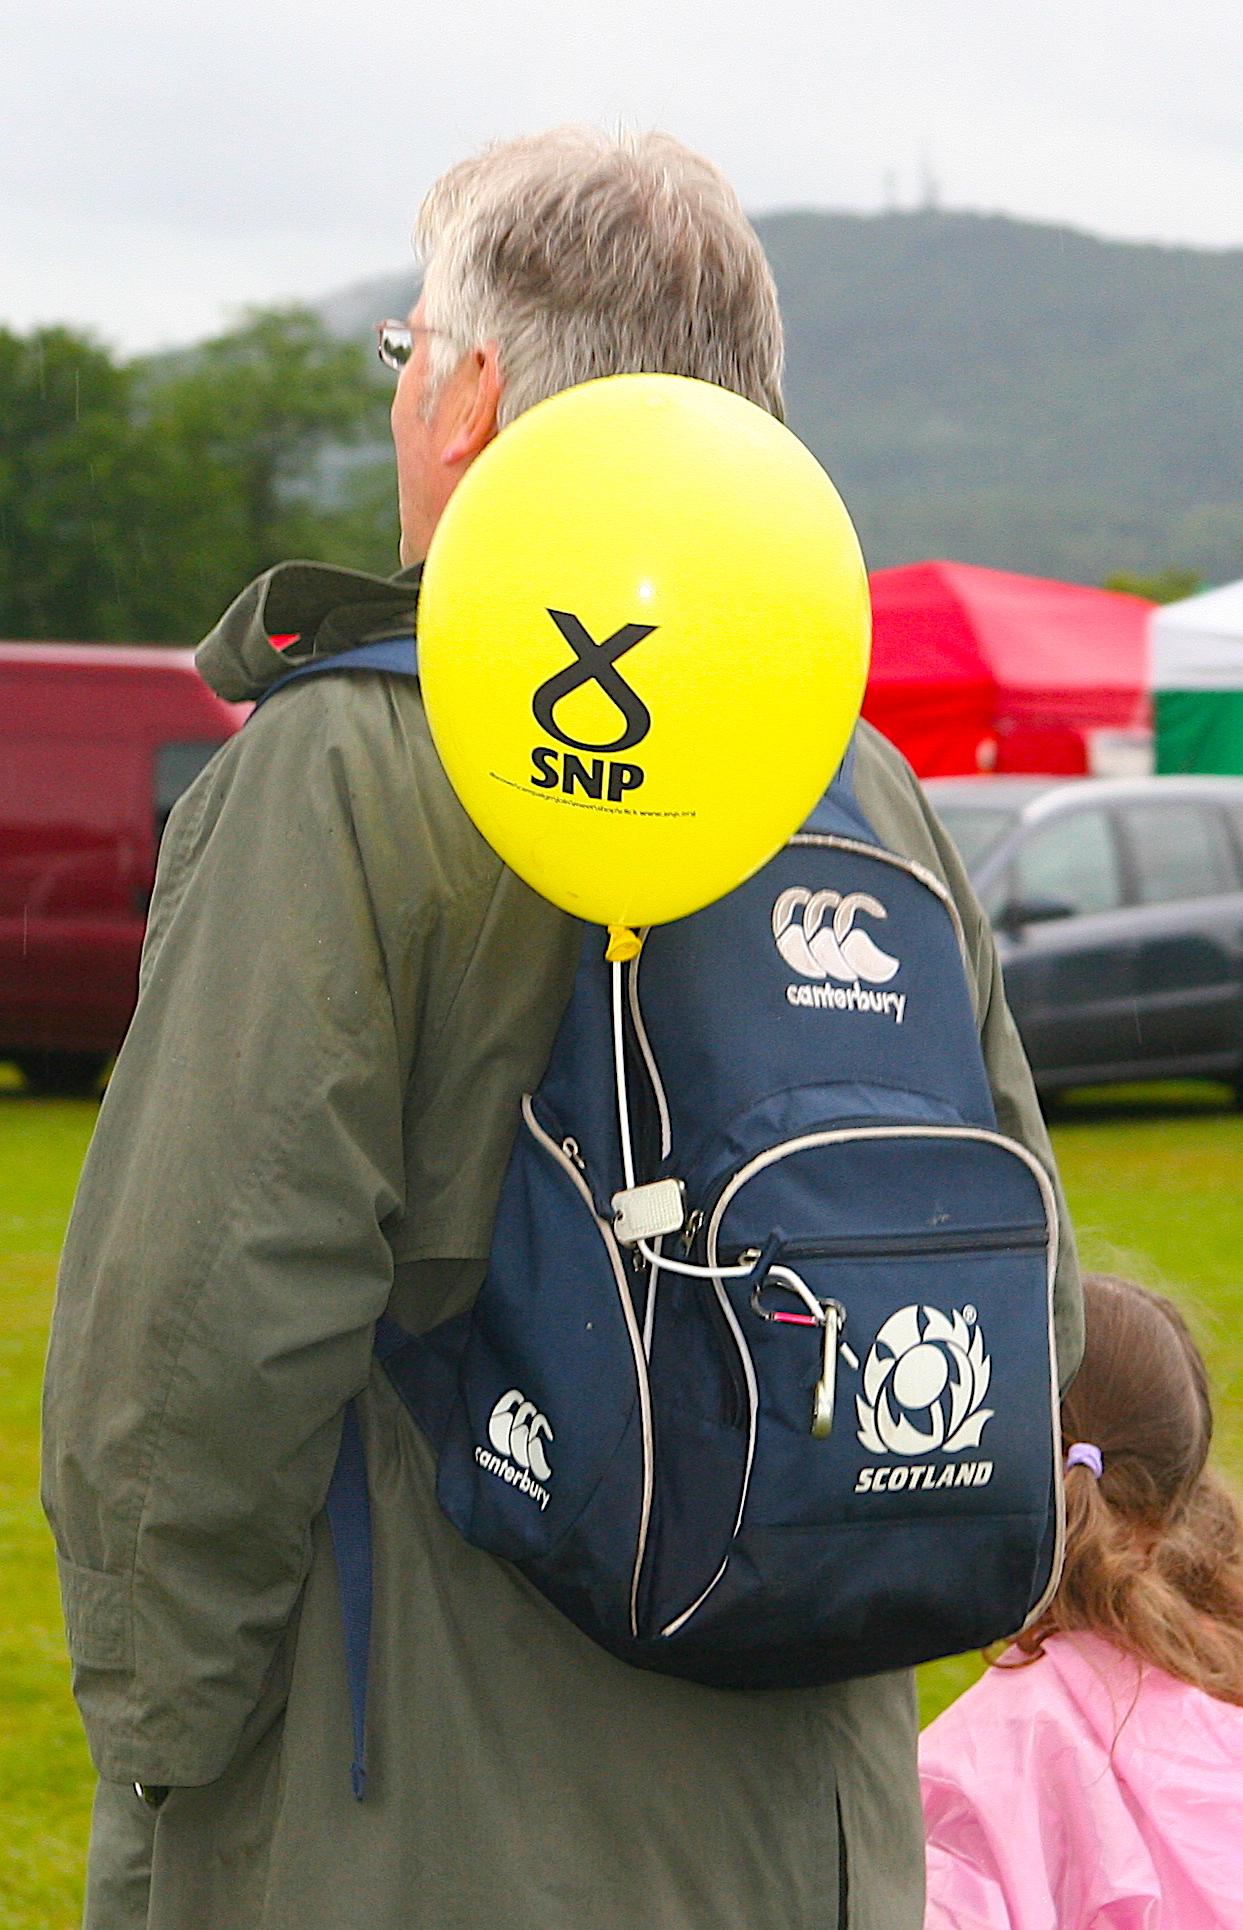 SNP yellow balloon